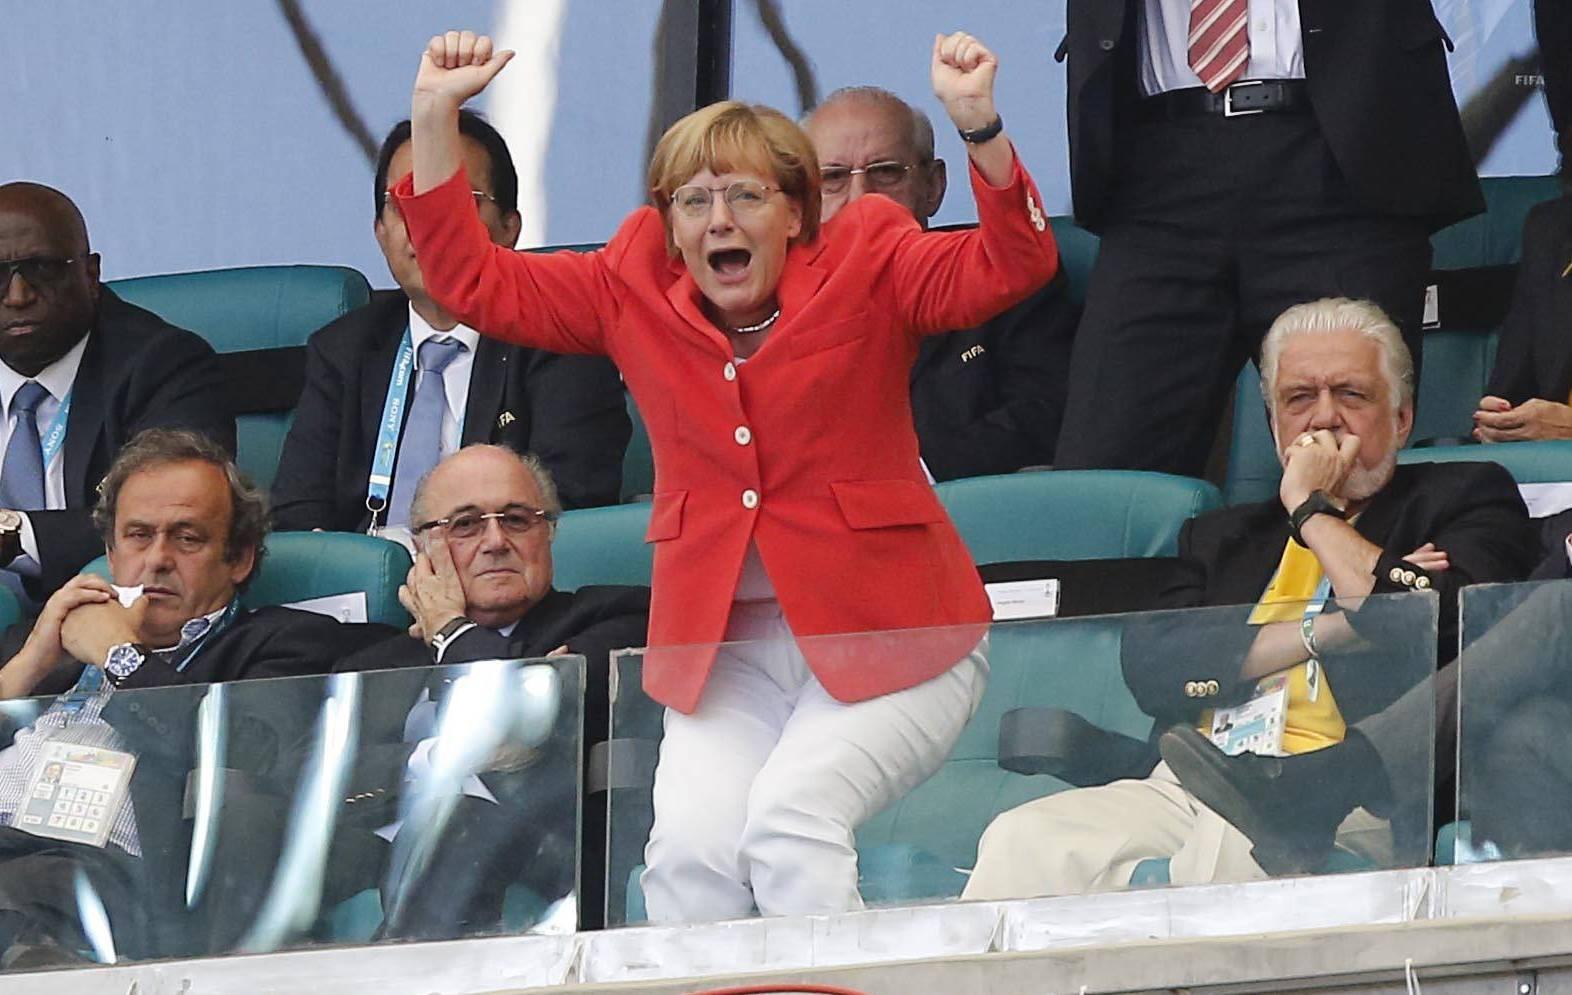 les allemands se concentrent sur le pr sent 2014 br sil coupe du monde football. Black Bedroom Furniture Sets. Home Design Ideas